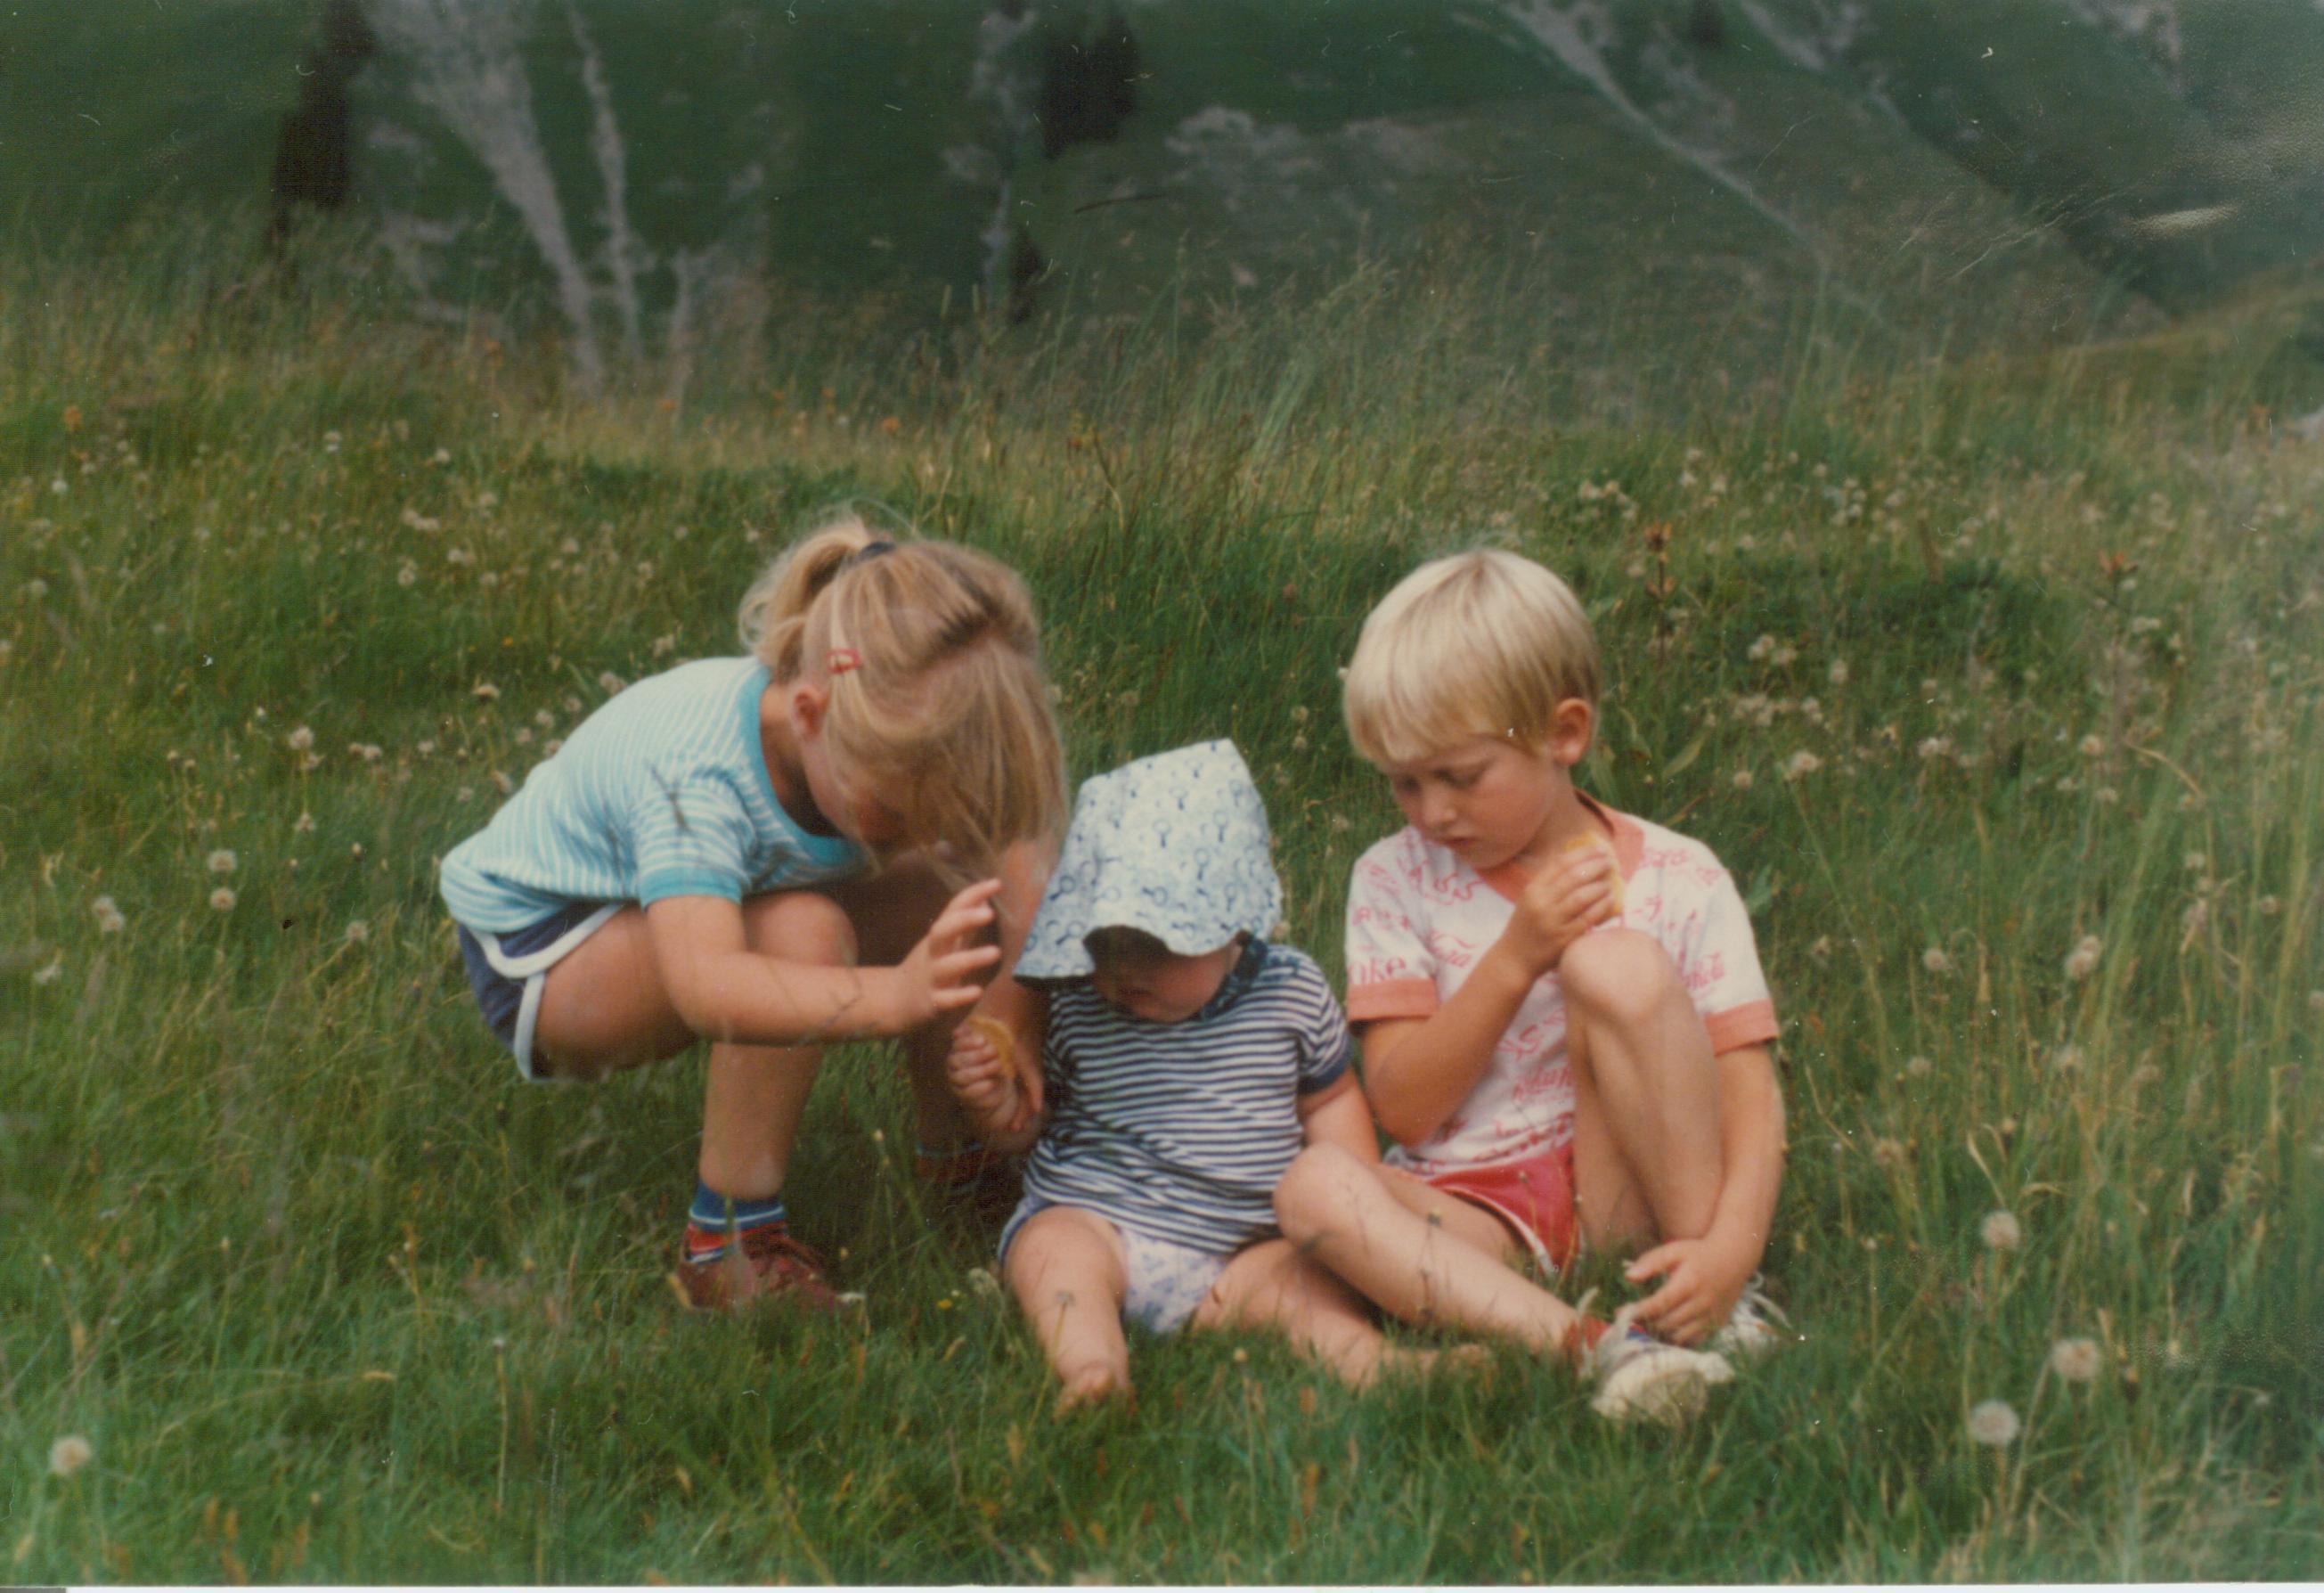 1984 - Wiesenidylle